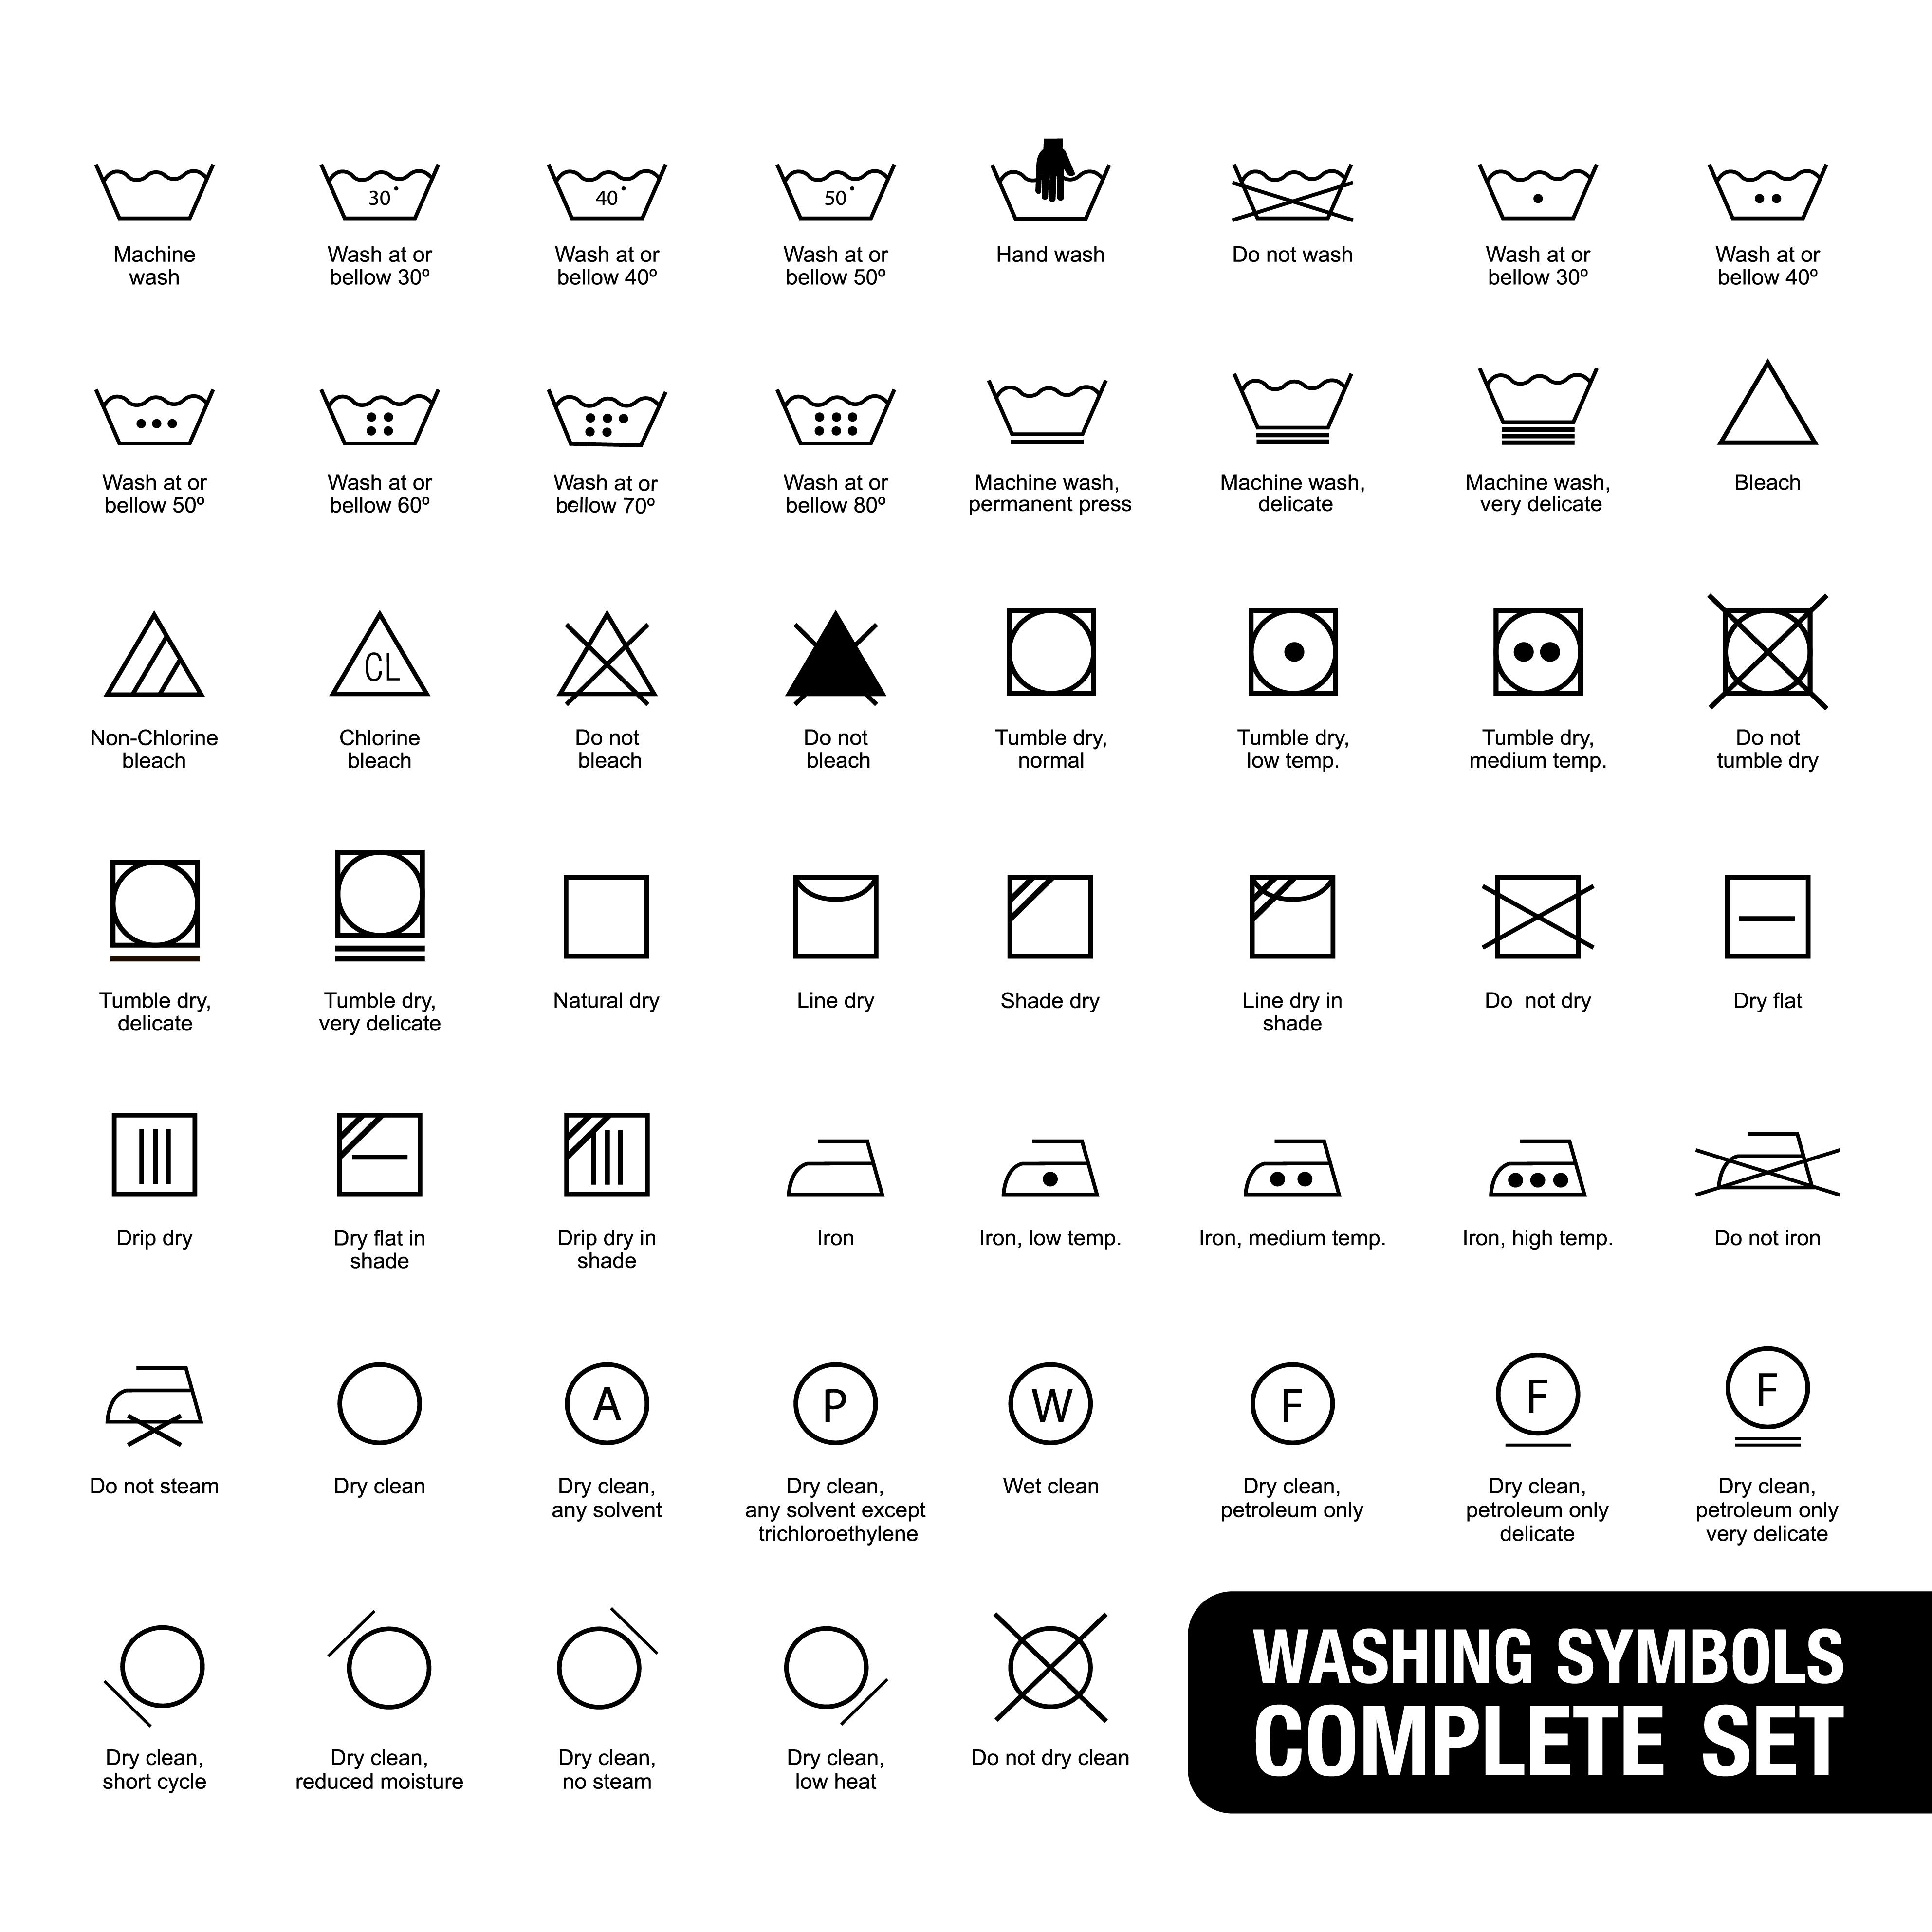 Complete Set Of Laundry Symbols.